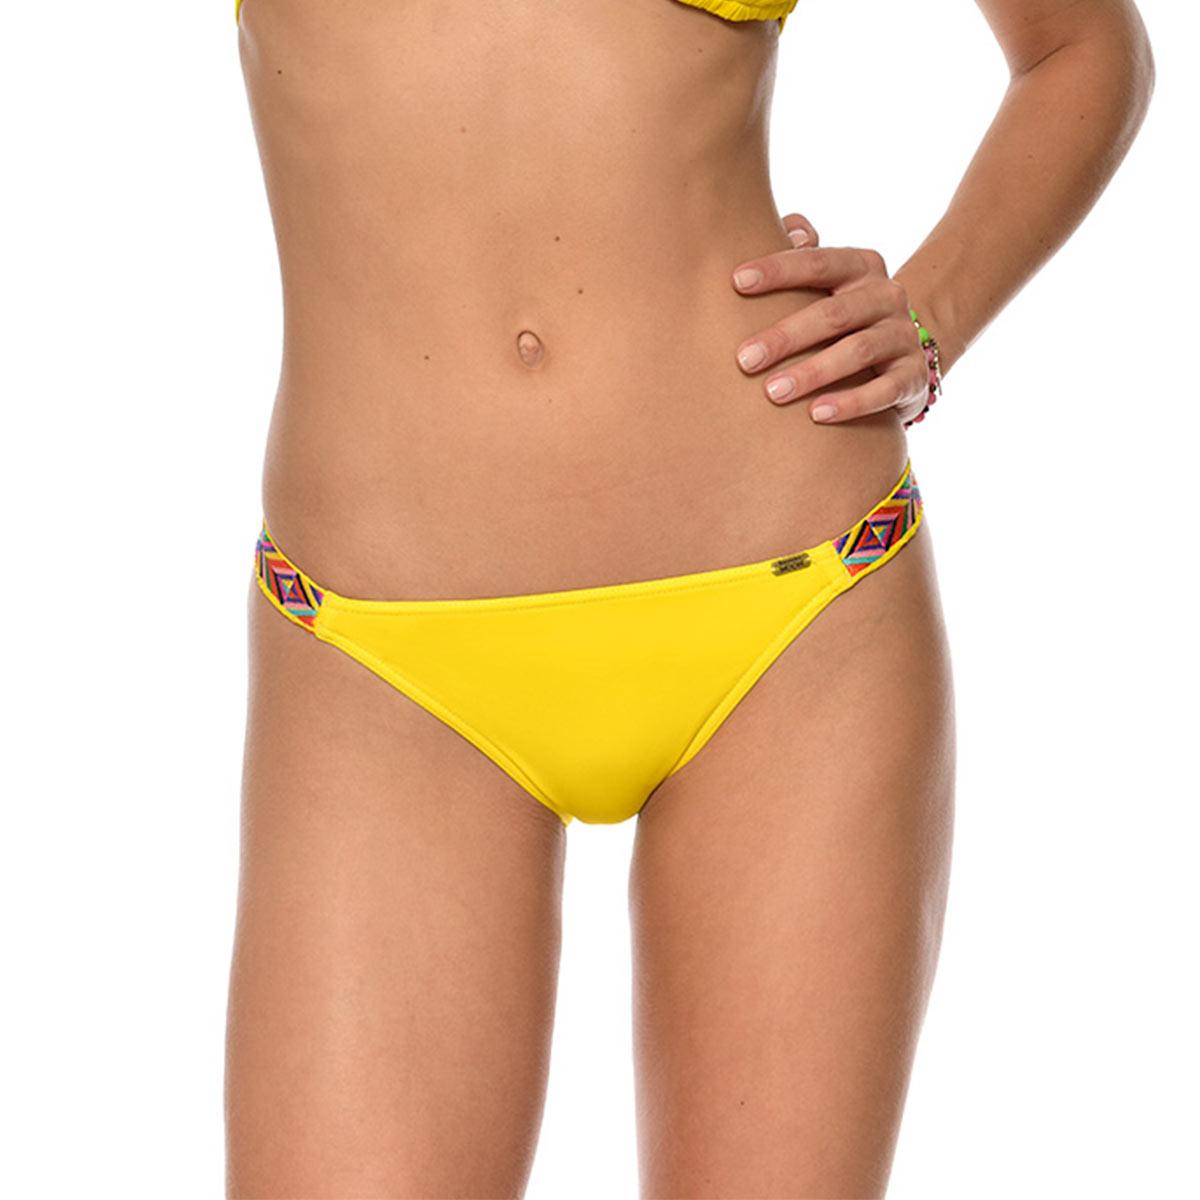 Maillot de bain culotte liens fins jaune Naranja (Bas)